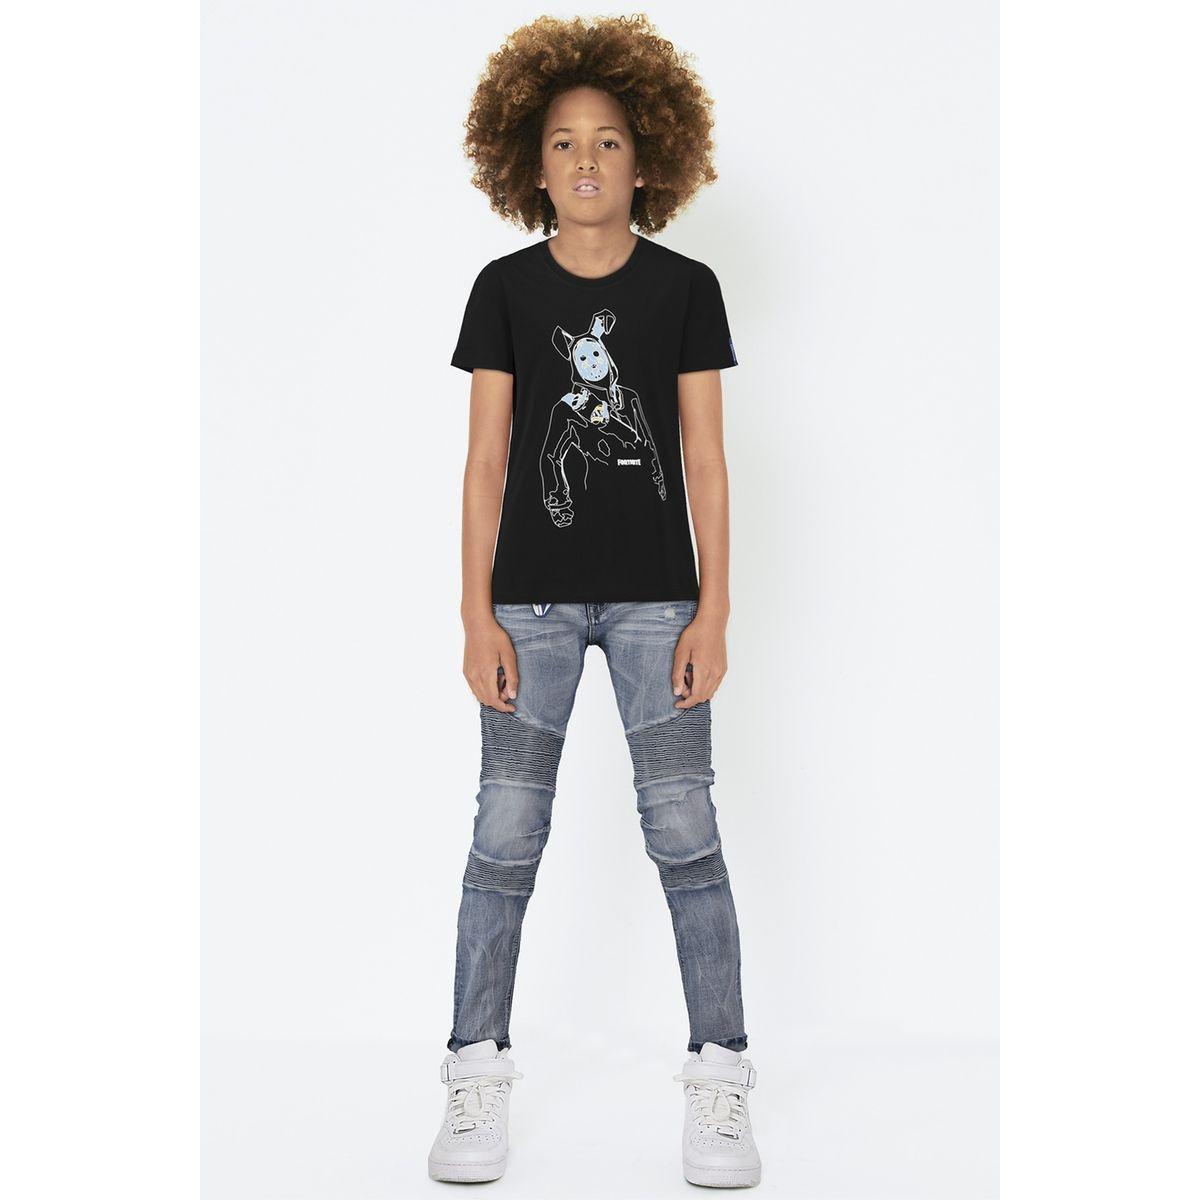 T-shirt Efortnite1